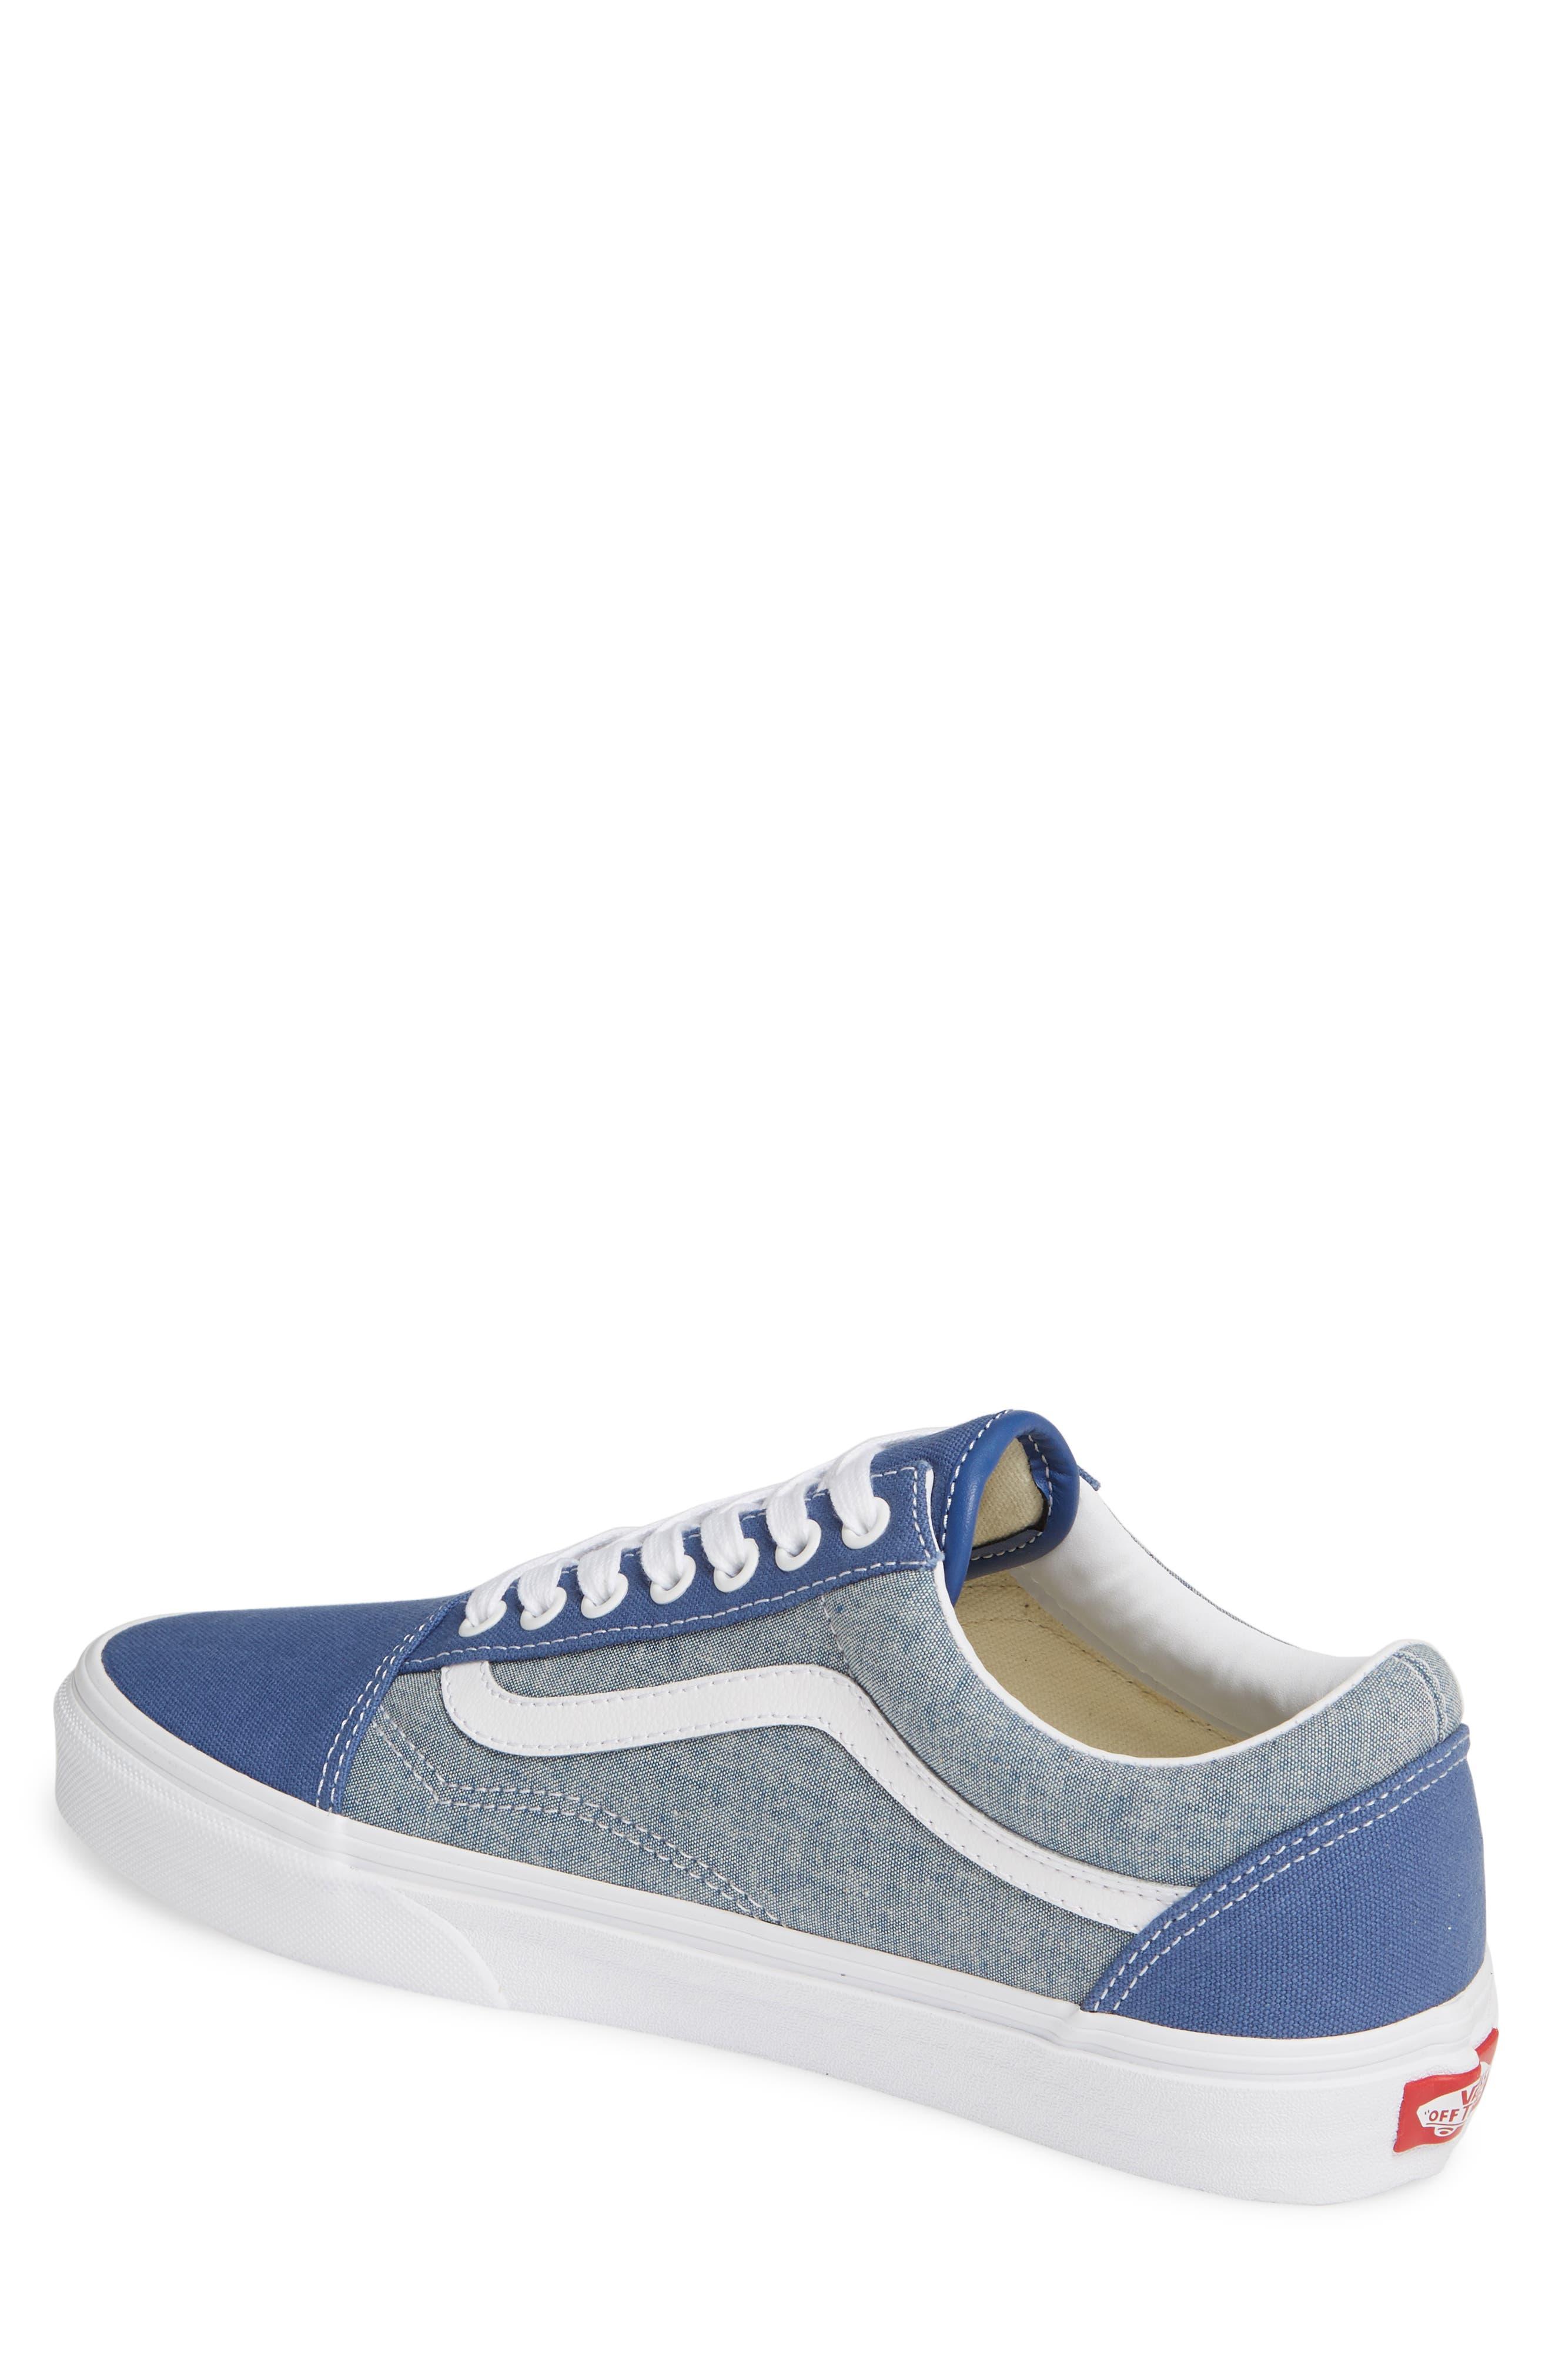 VANS, Old Skool Sneaker, Alternate thumbnail 2, color, CANVAS NAVY/ WHITE CHAMBRAY